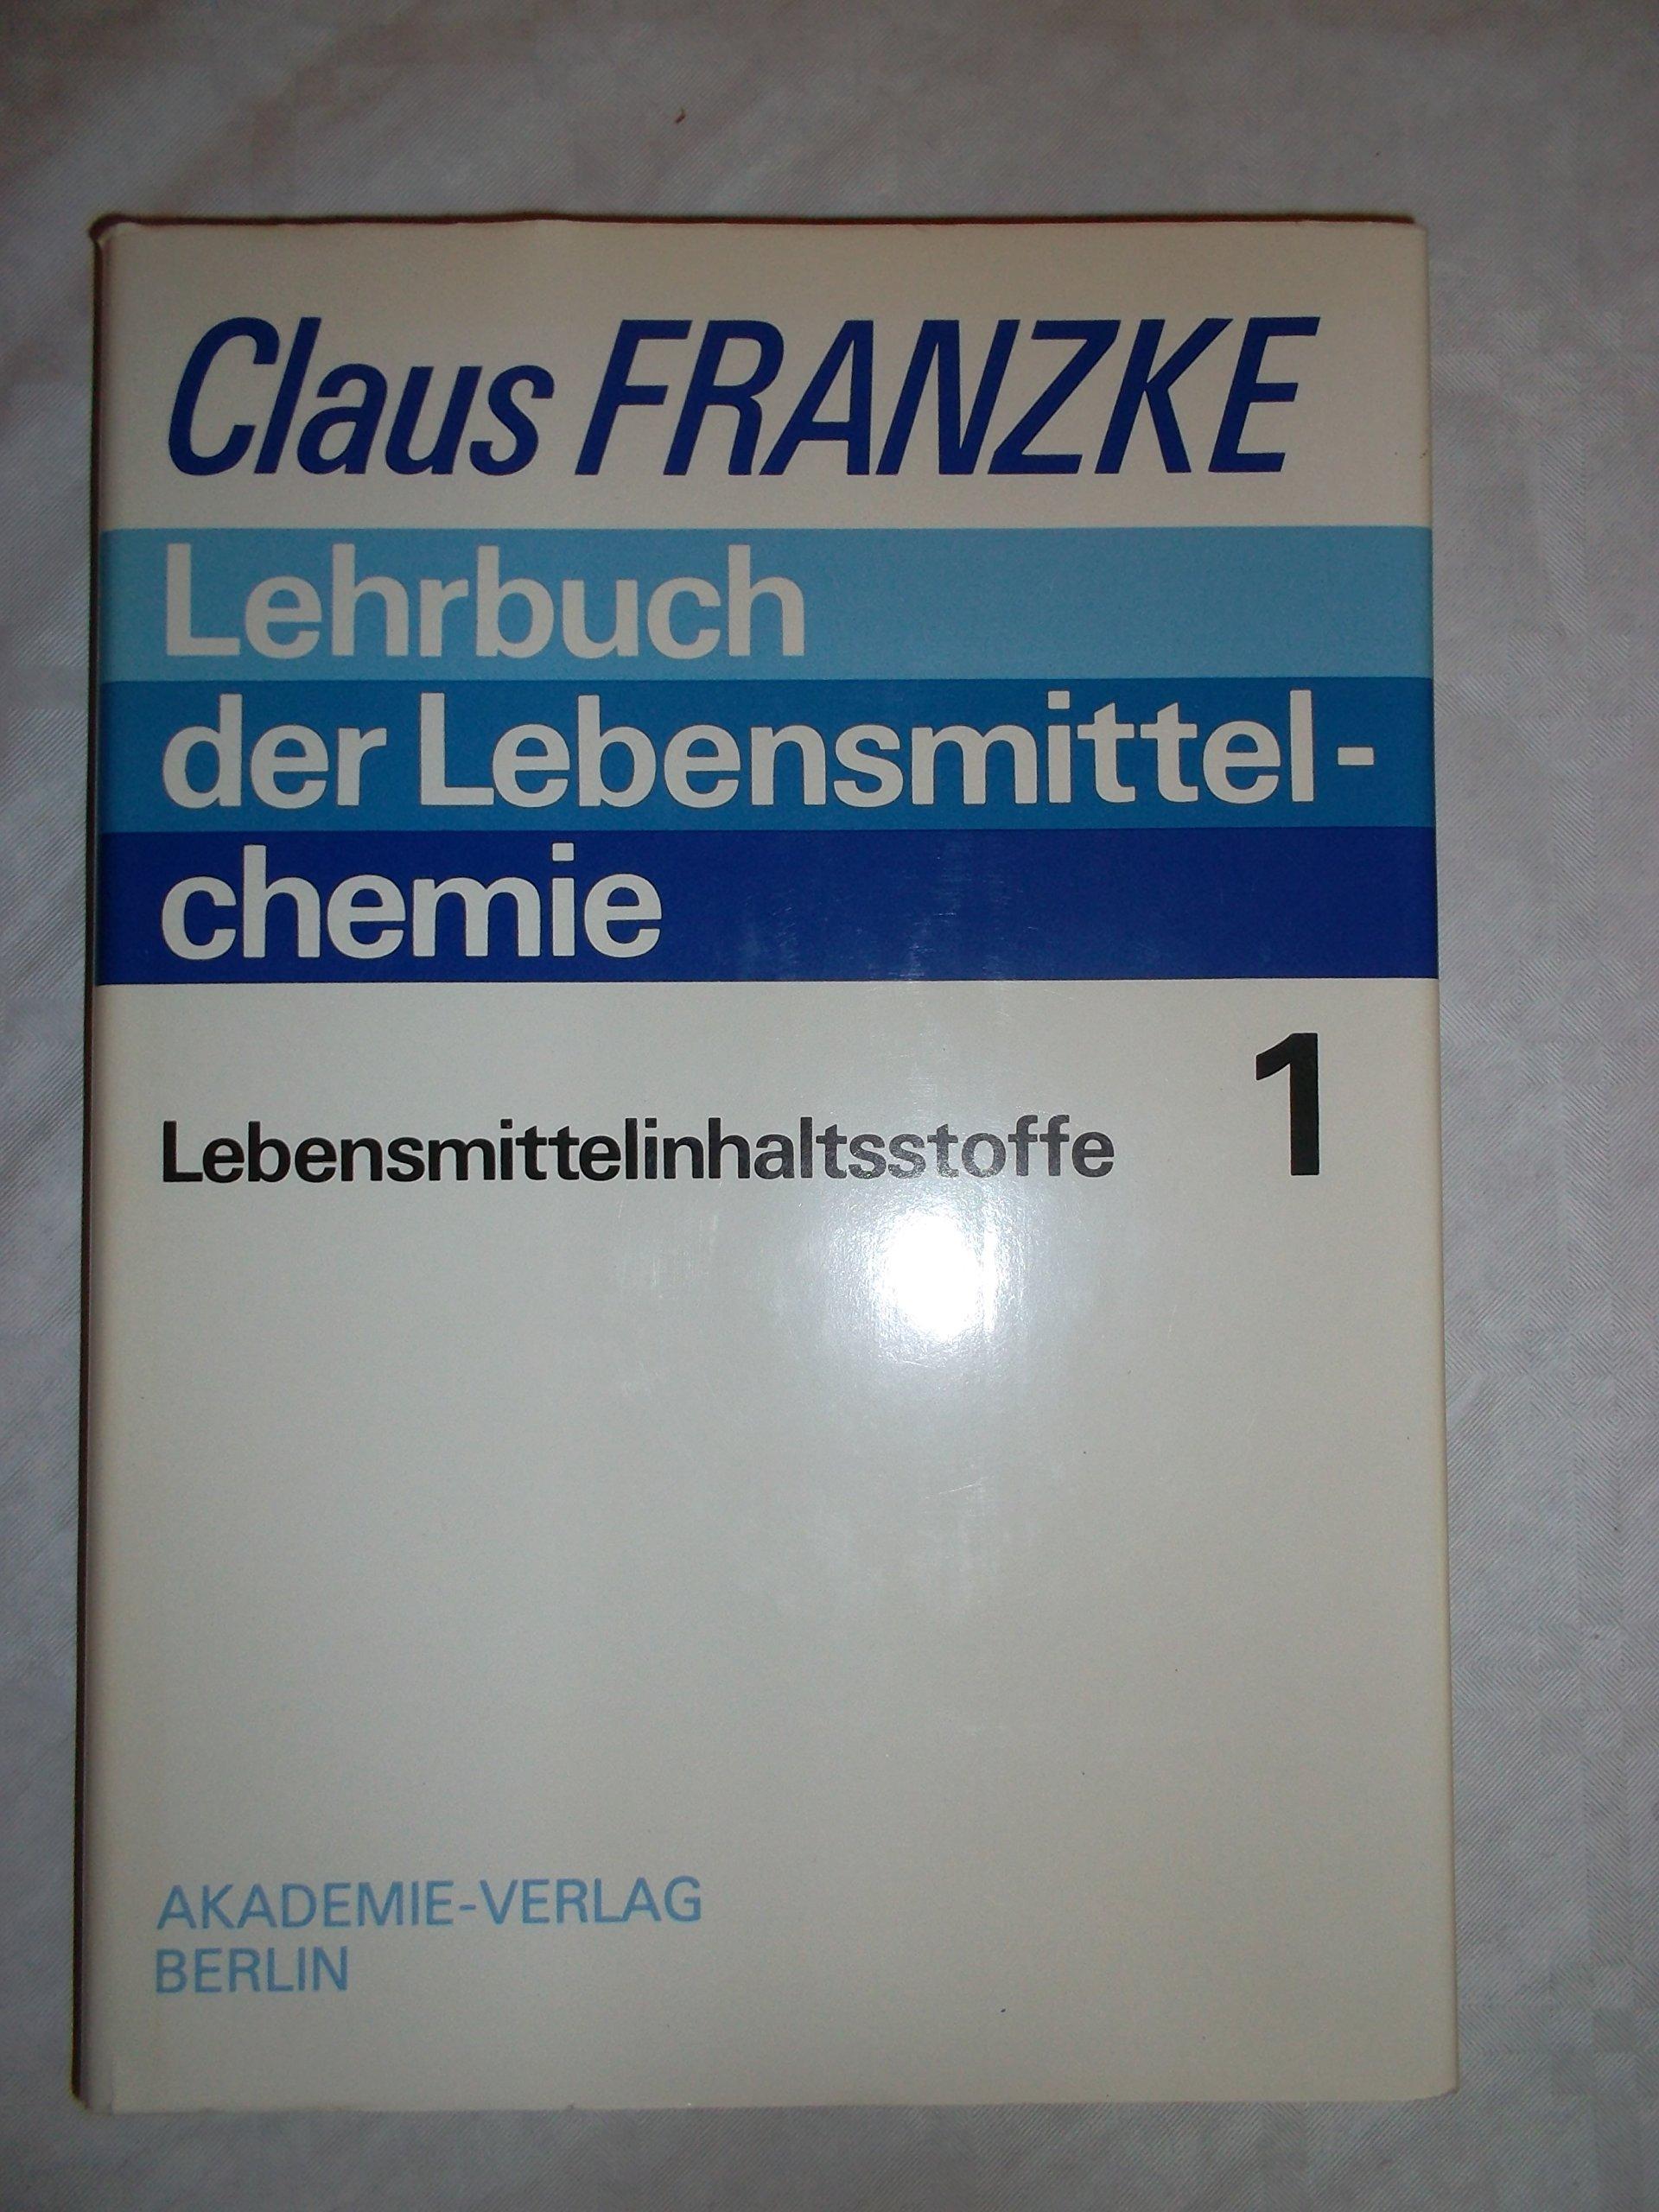 Lehrbuch der Lebensmittelchemie, Bd.1, Lebensmittelinhaltsstoffe (Lehrbuch der Lebensmittelchemie (in 2 Baenden))